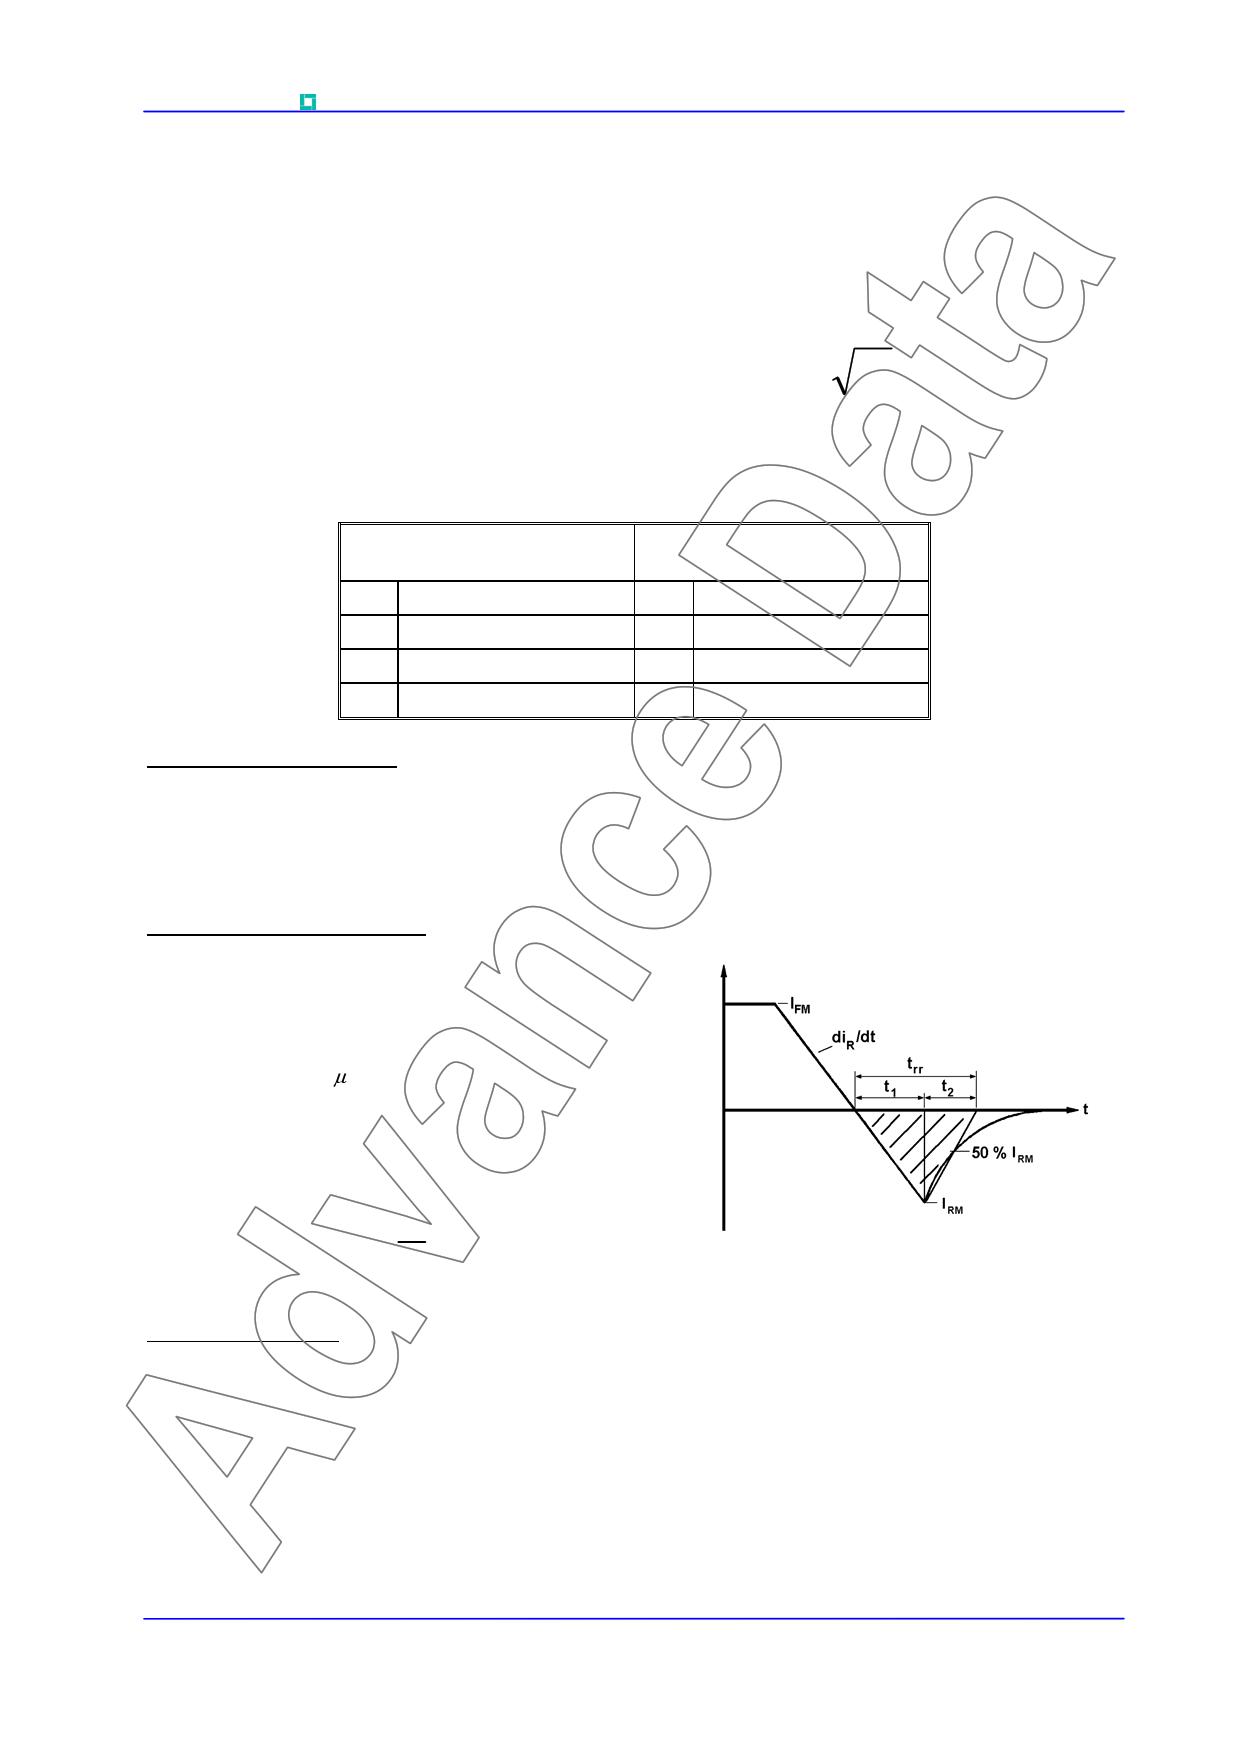 K0620QA620 pdf